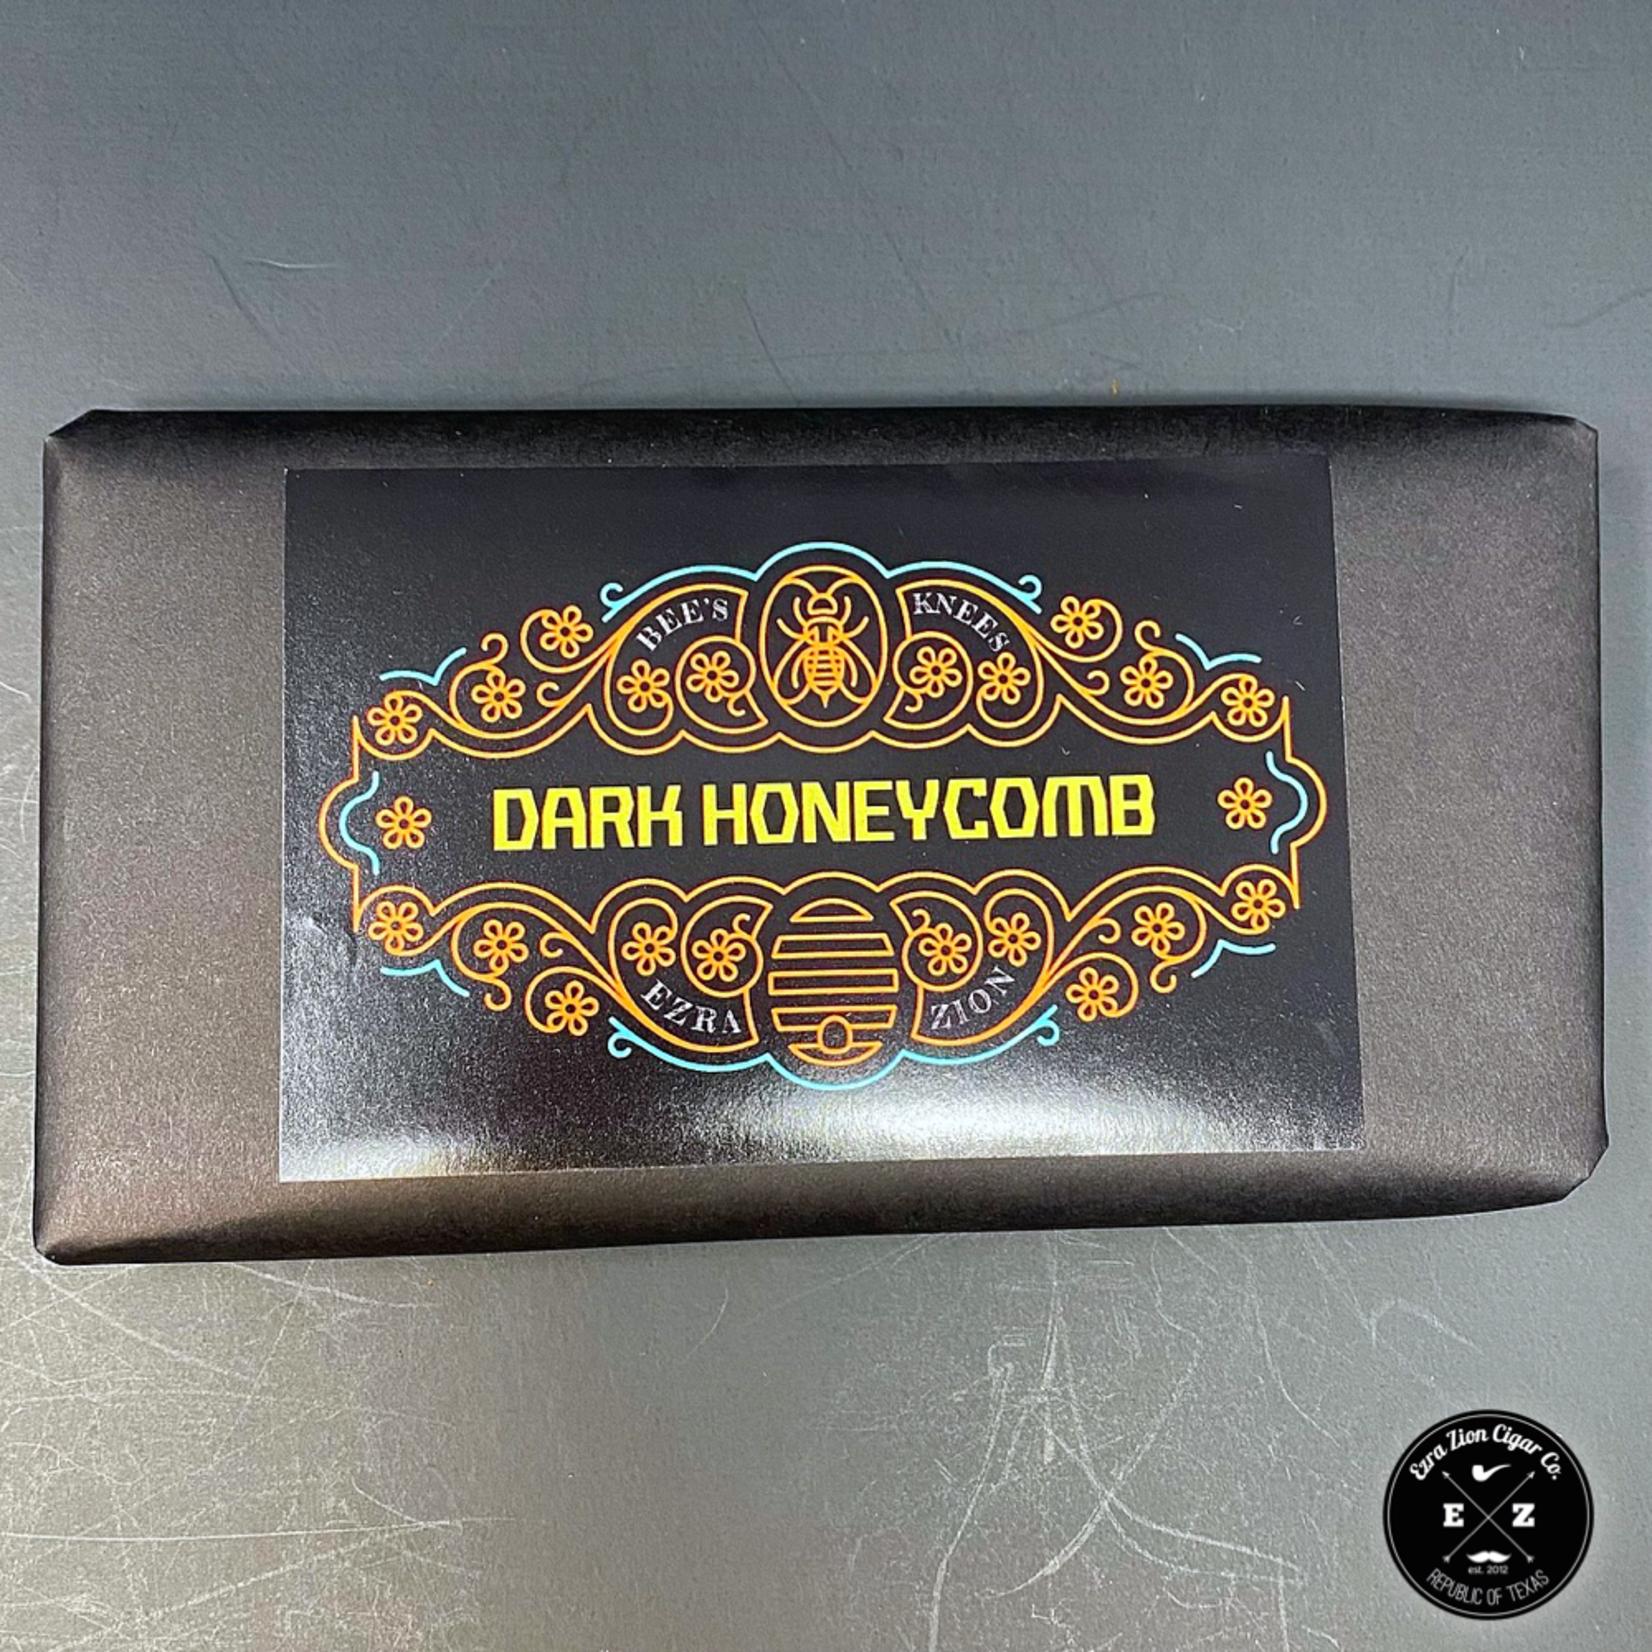 Ezra Zion Cigars Bee's Knees Dark Honeycomb